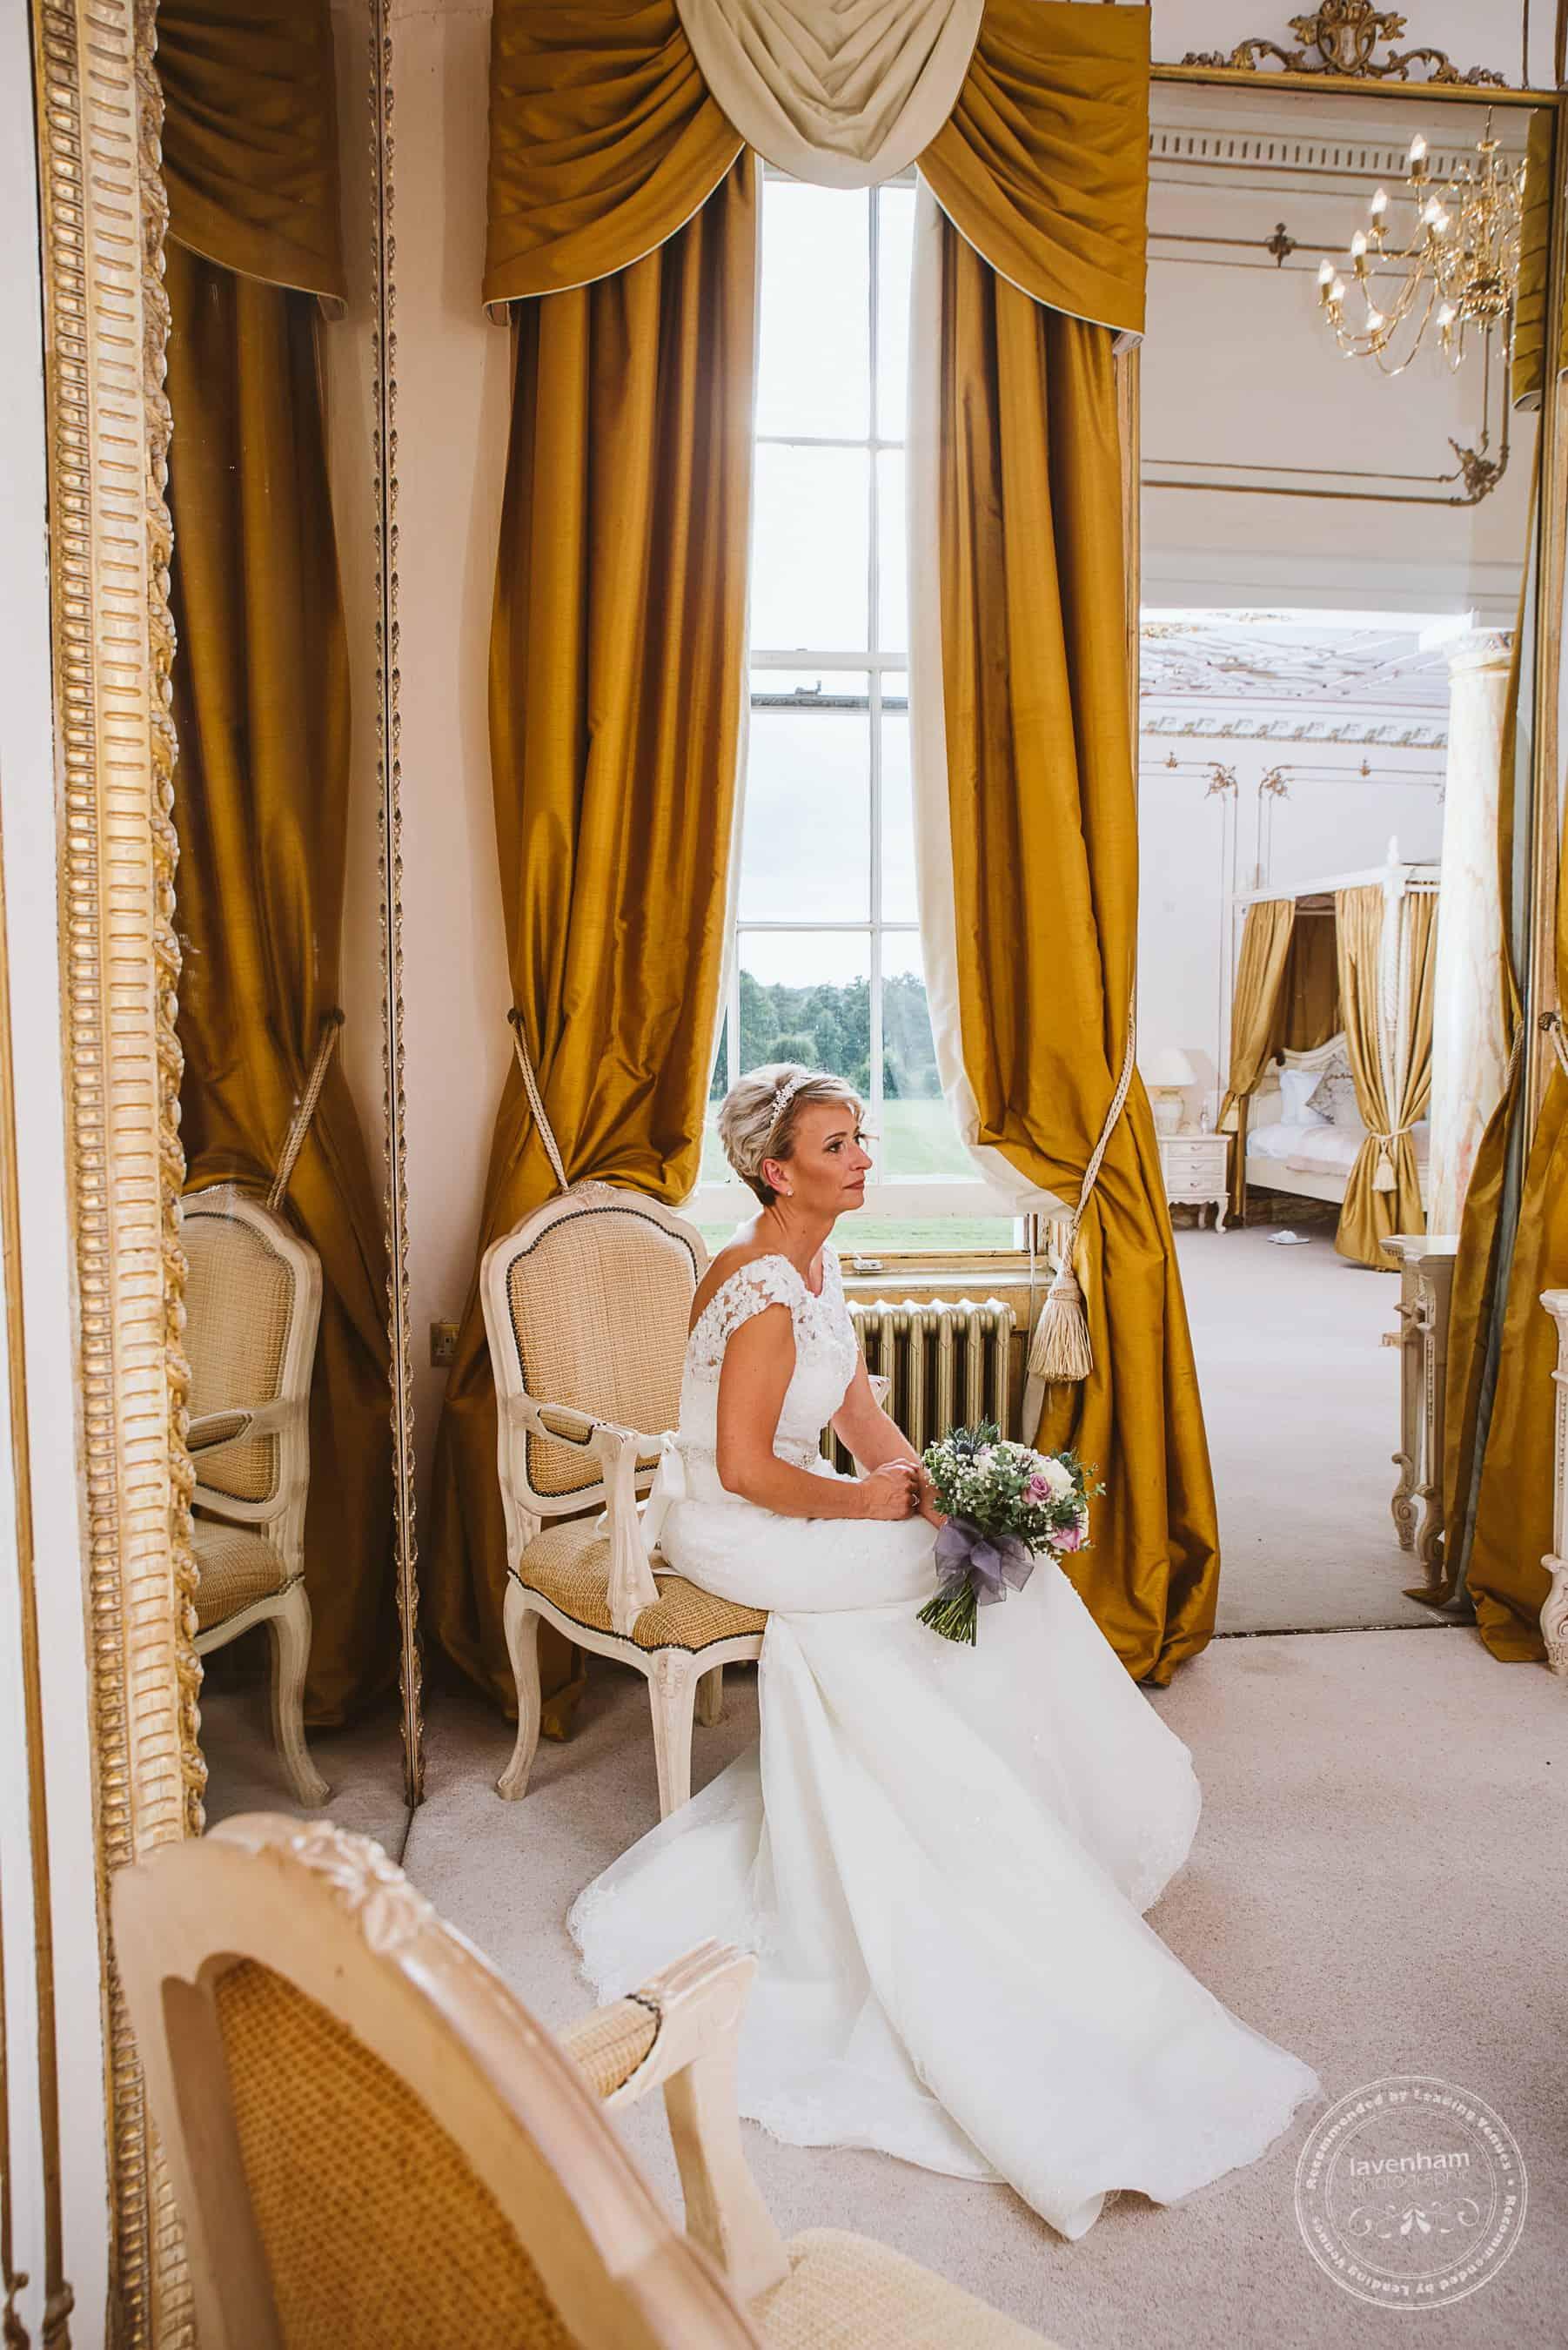 281018 Gosfield Hall Wedding Photography Lavenham Photographic 037